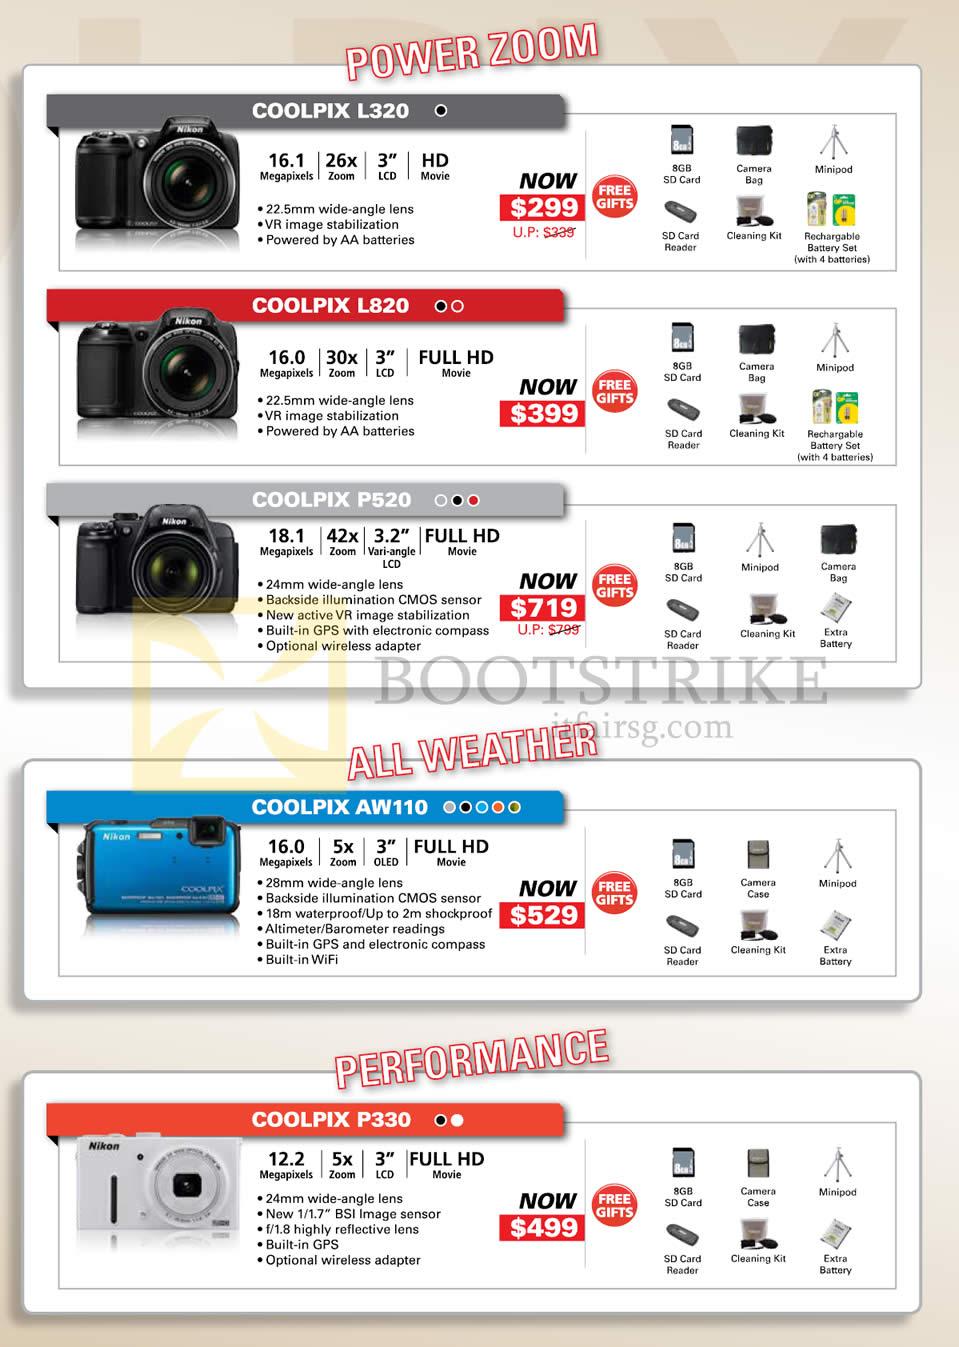 Top 10 Punto Medio Noticias | Nikon D5200 Price In Singapore